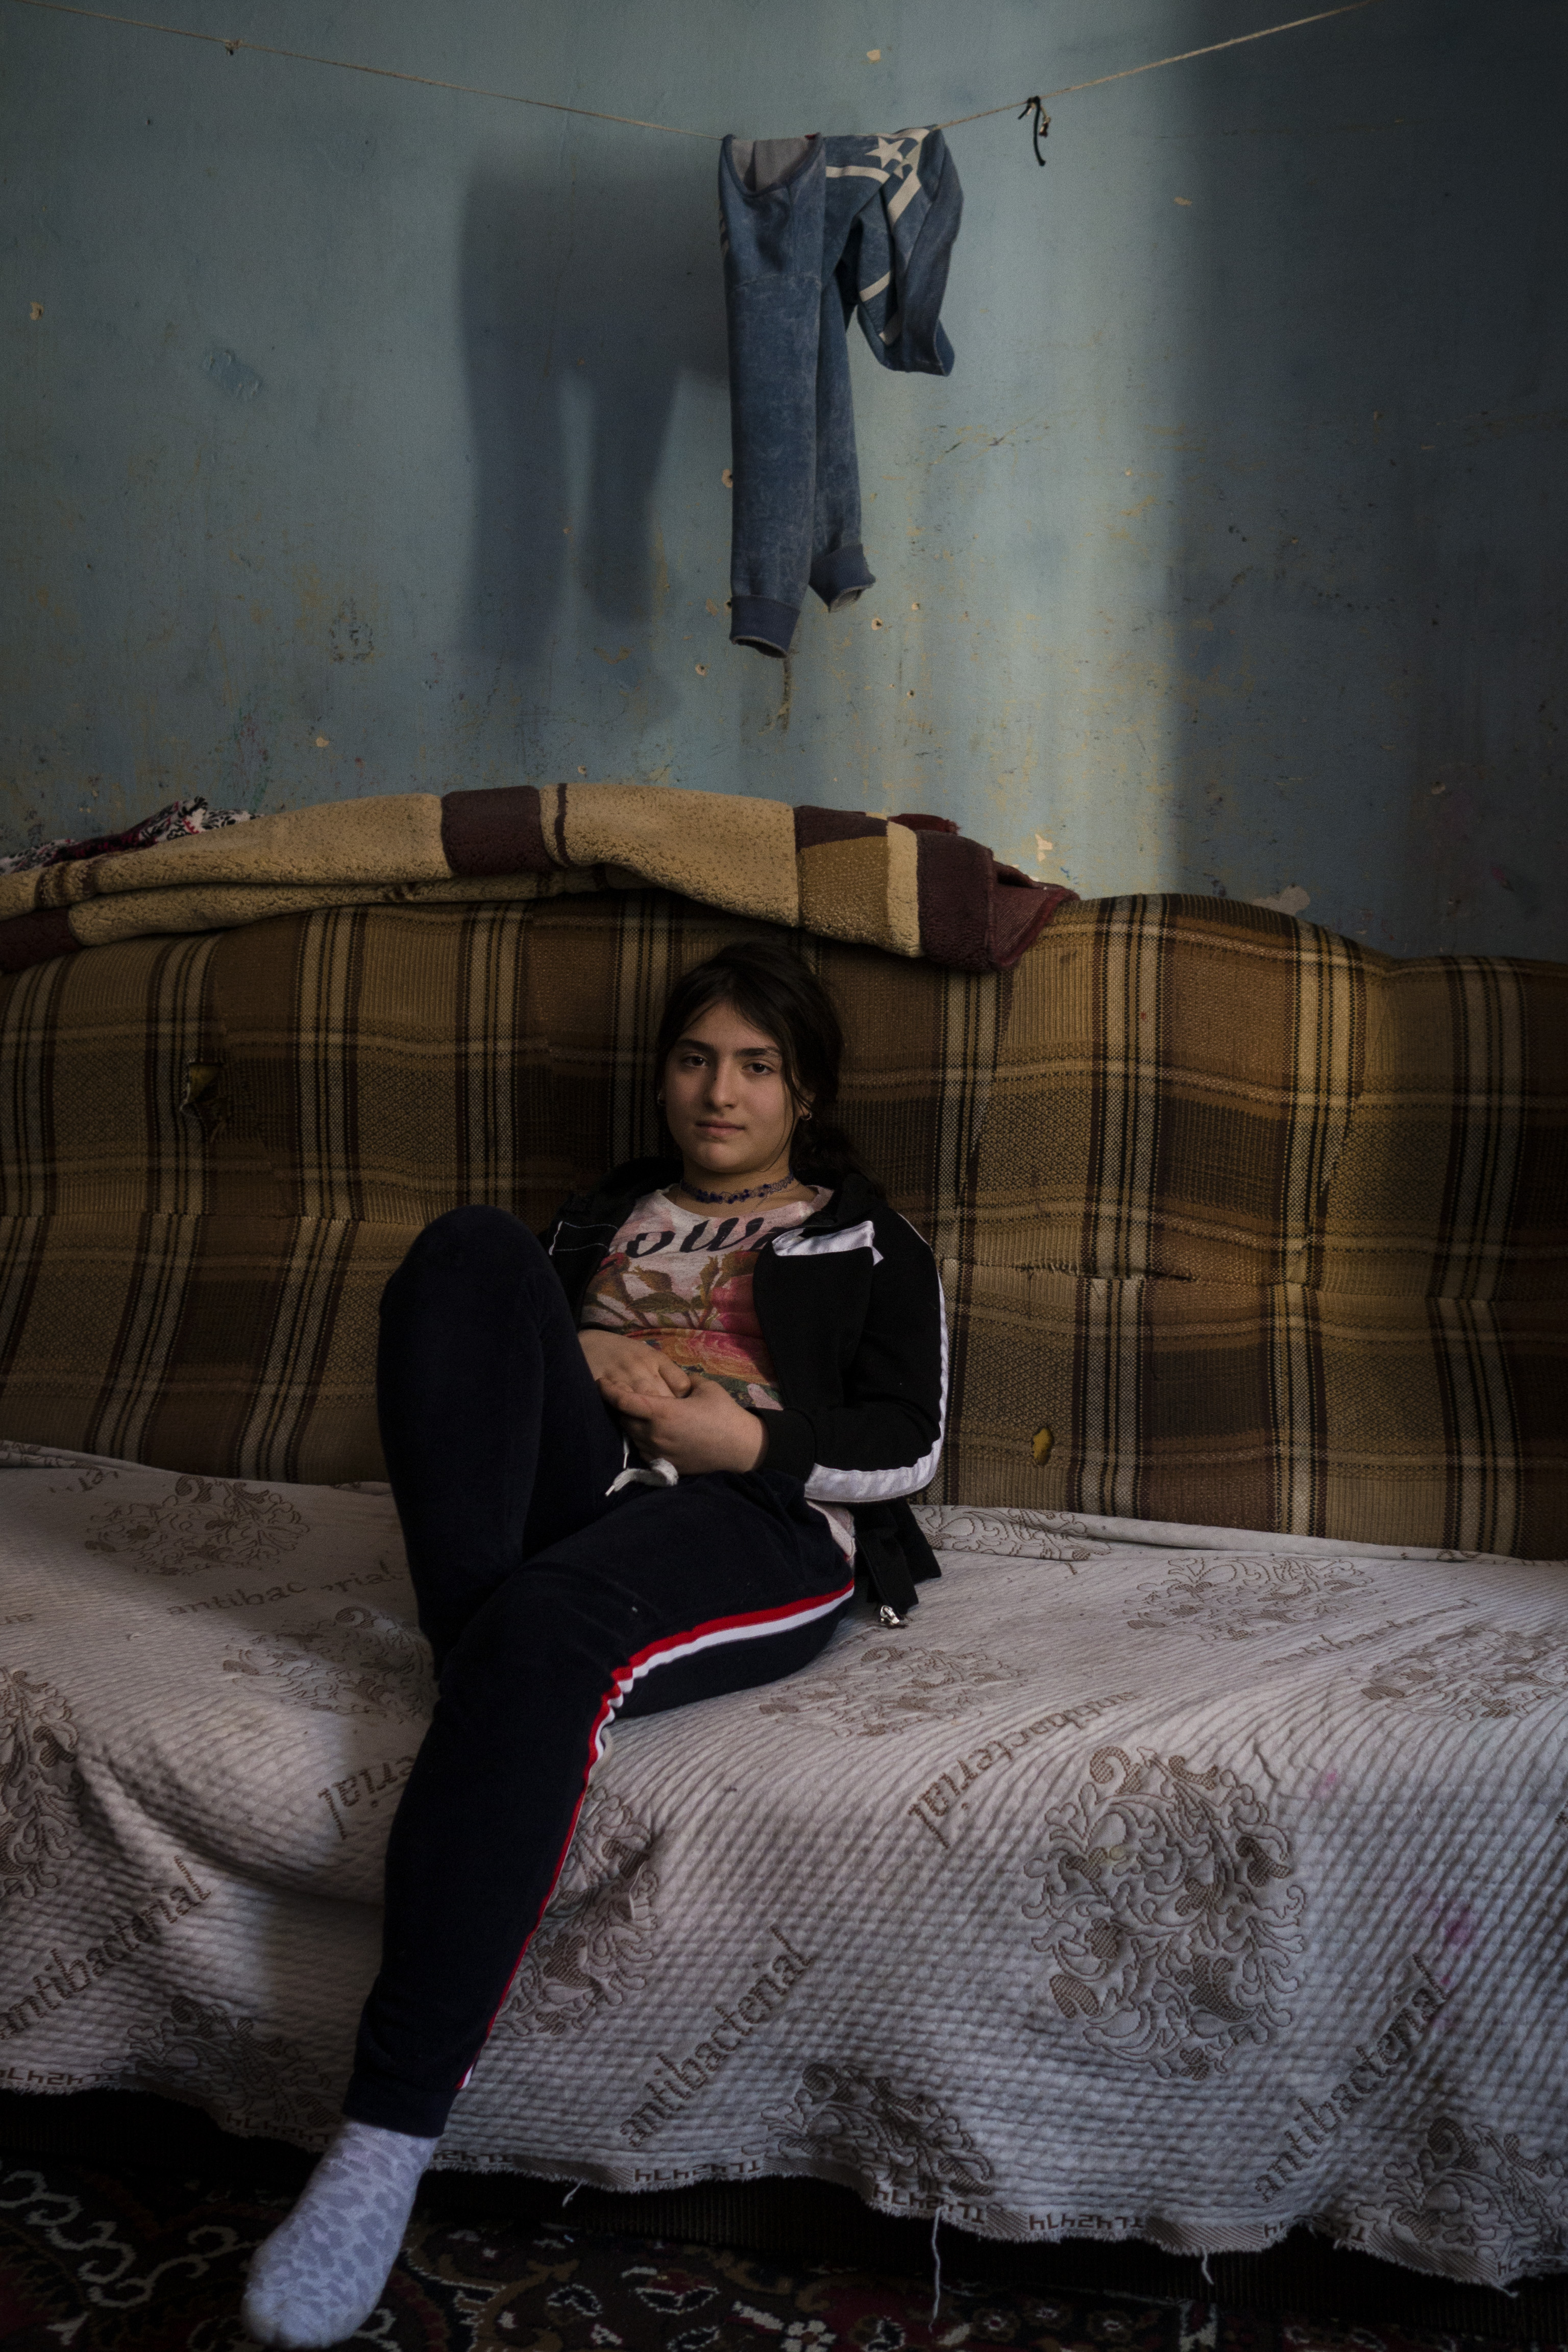 Fattigdom i Europa: Nicoleta, 12 år, roma, Rumænien.